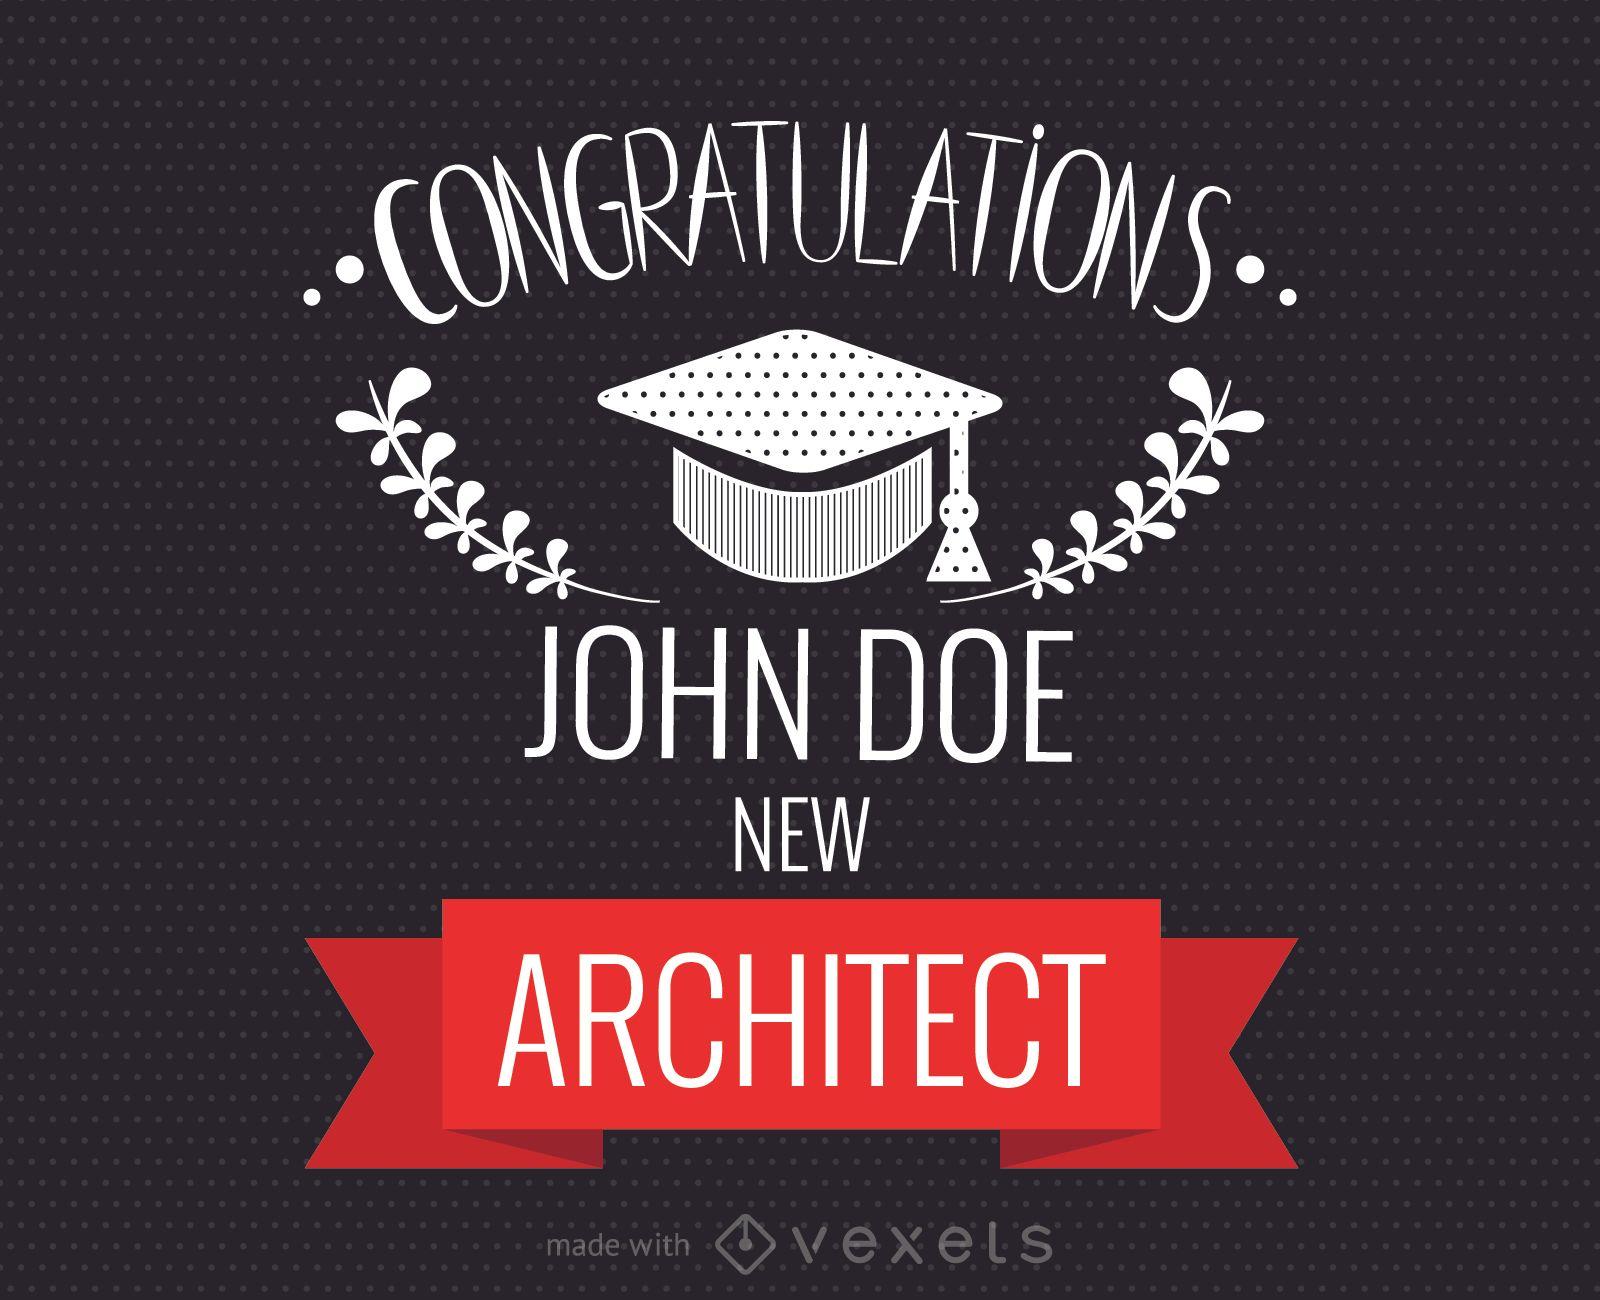 Graduation Congratulations Card Maker Editable Design